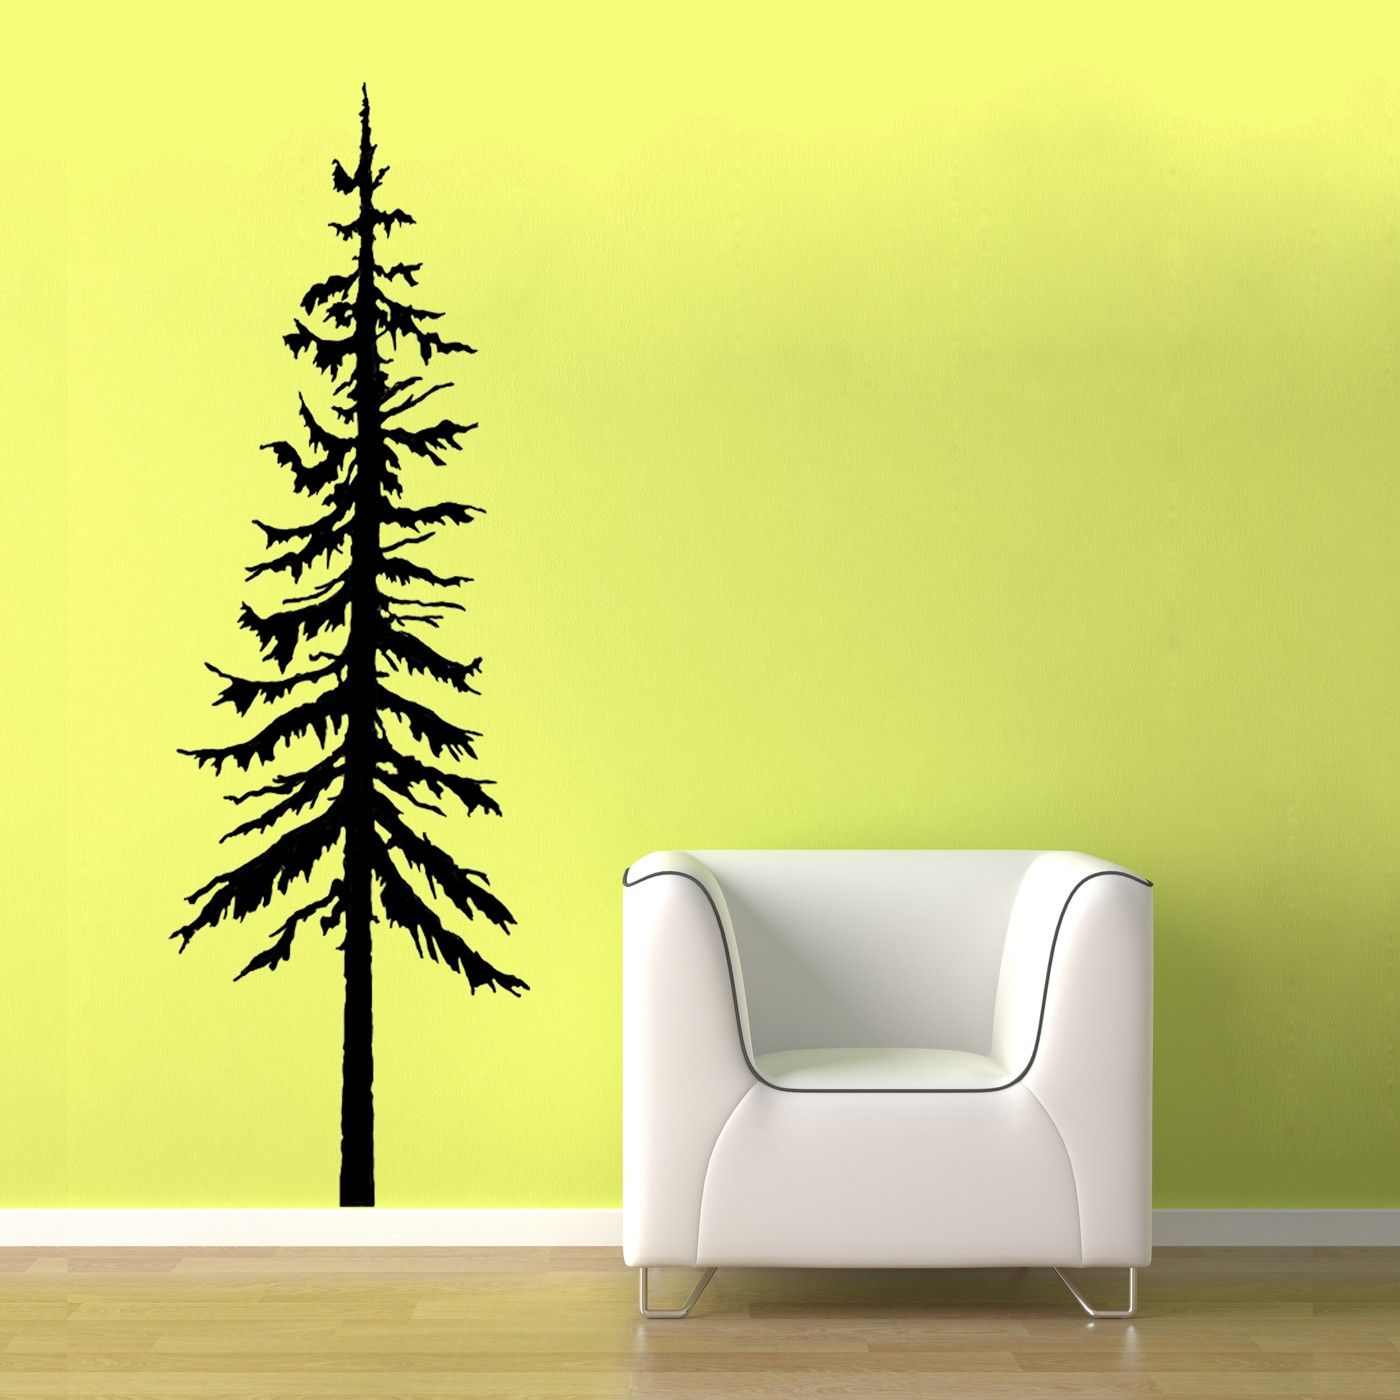 Pine Tree Decal Vinyl Wall Graphic Pine Tree Decal Pine Trees - Custom vinyl wall decals large